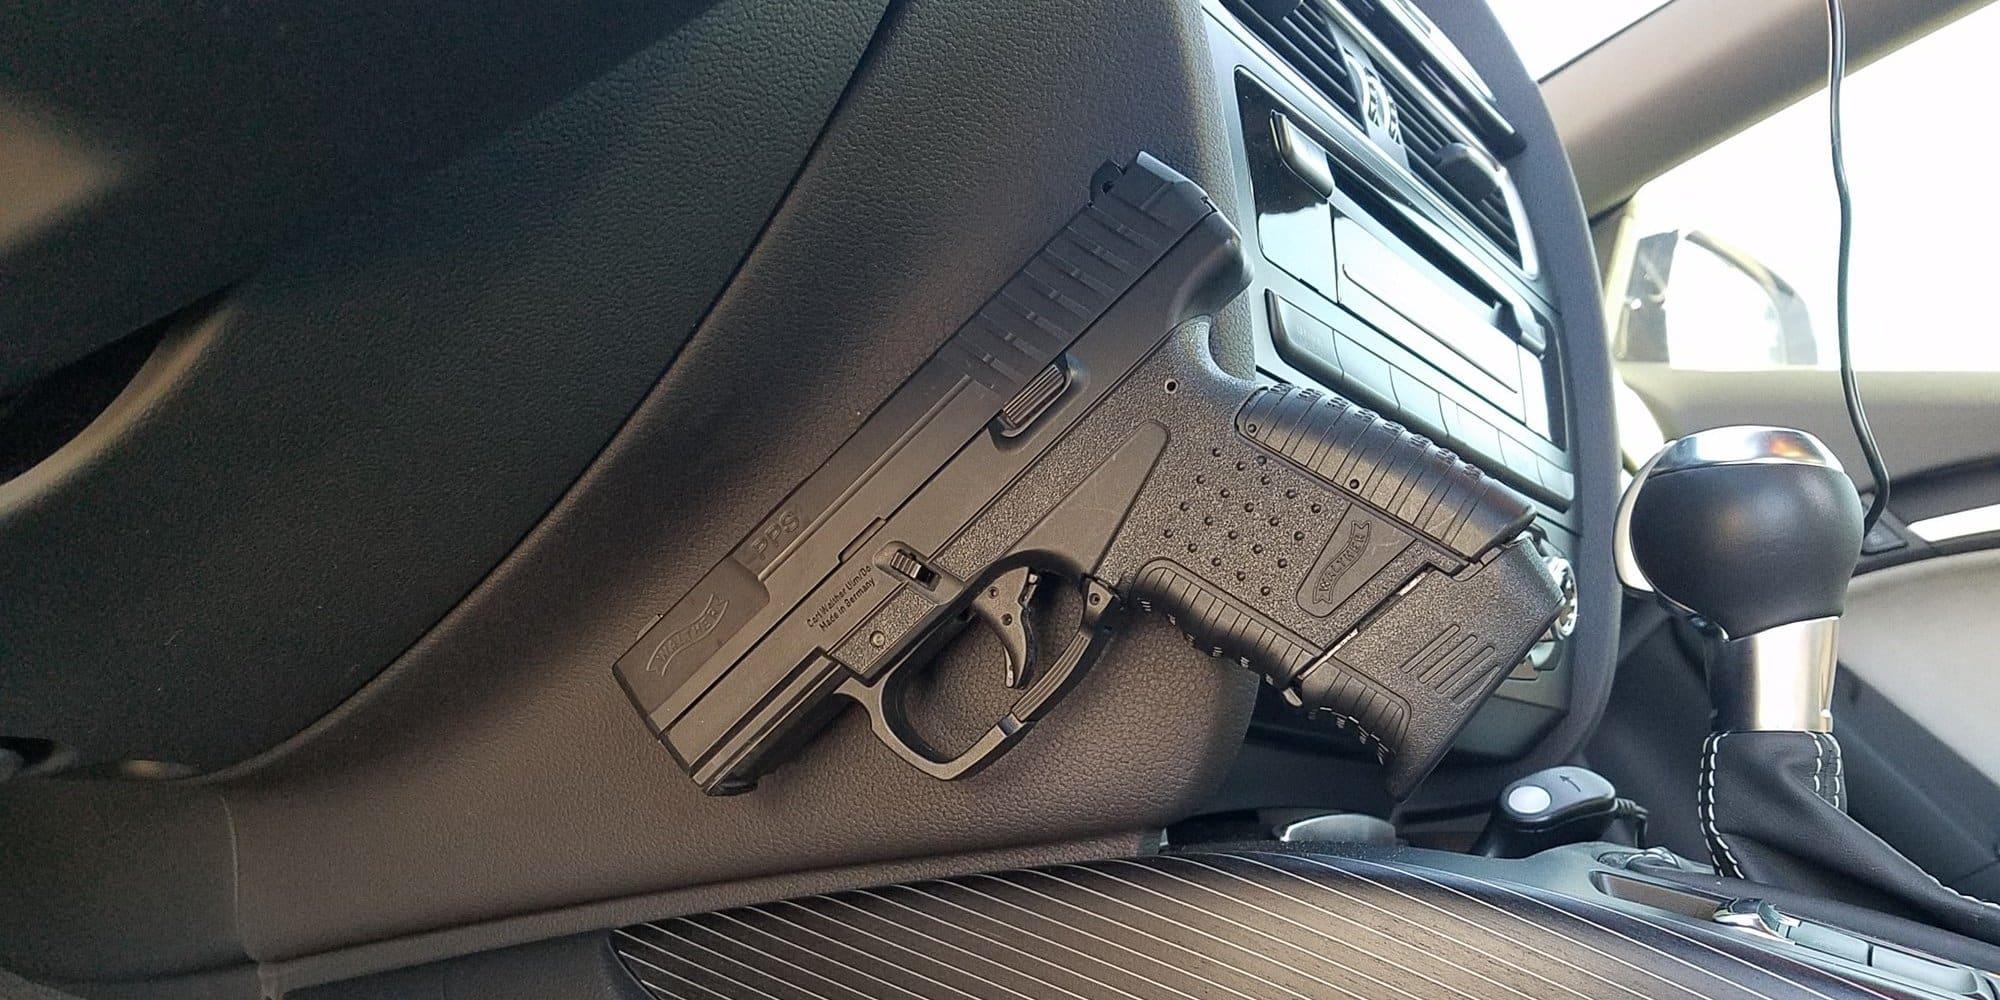 Top 5 magnet gun holsters for car in 2020